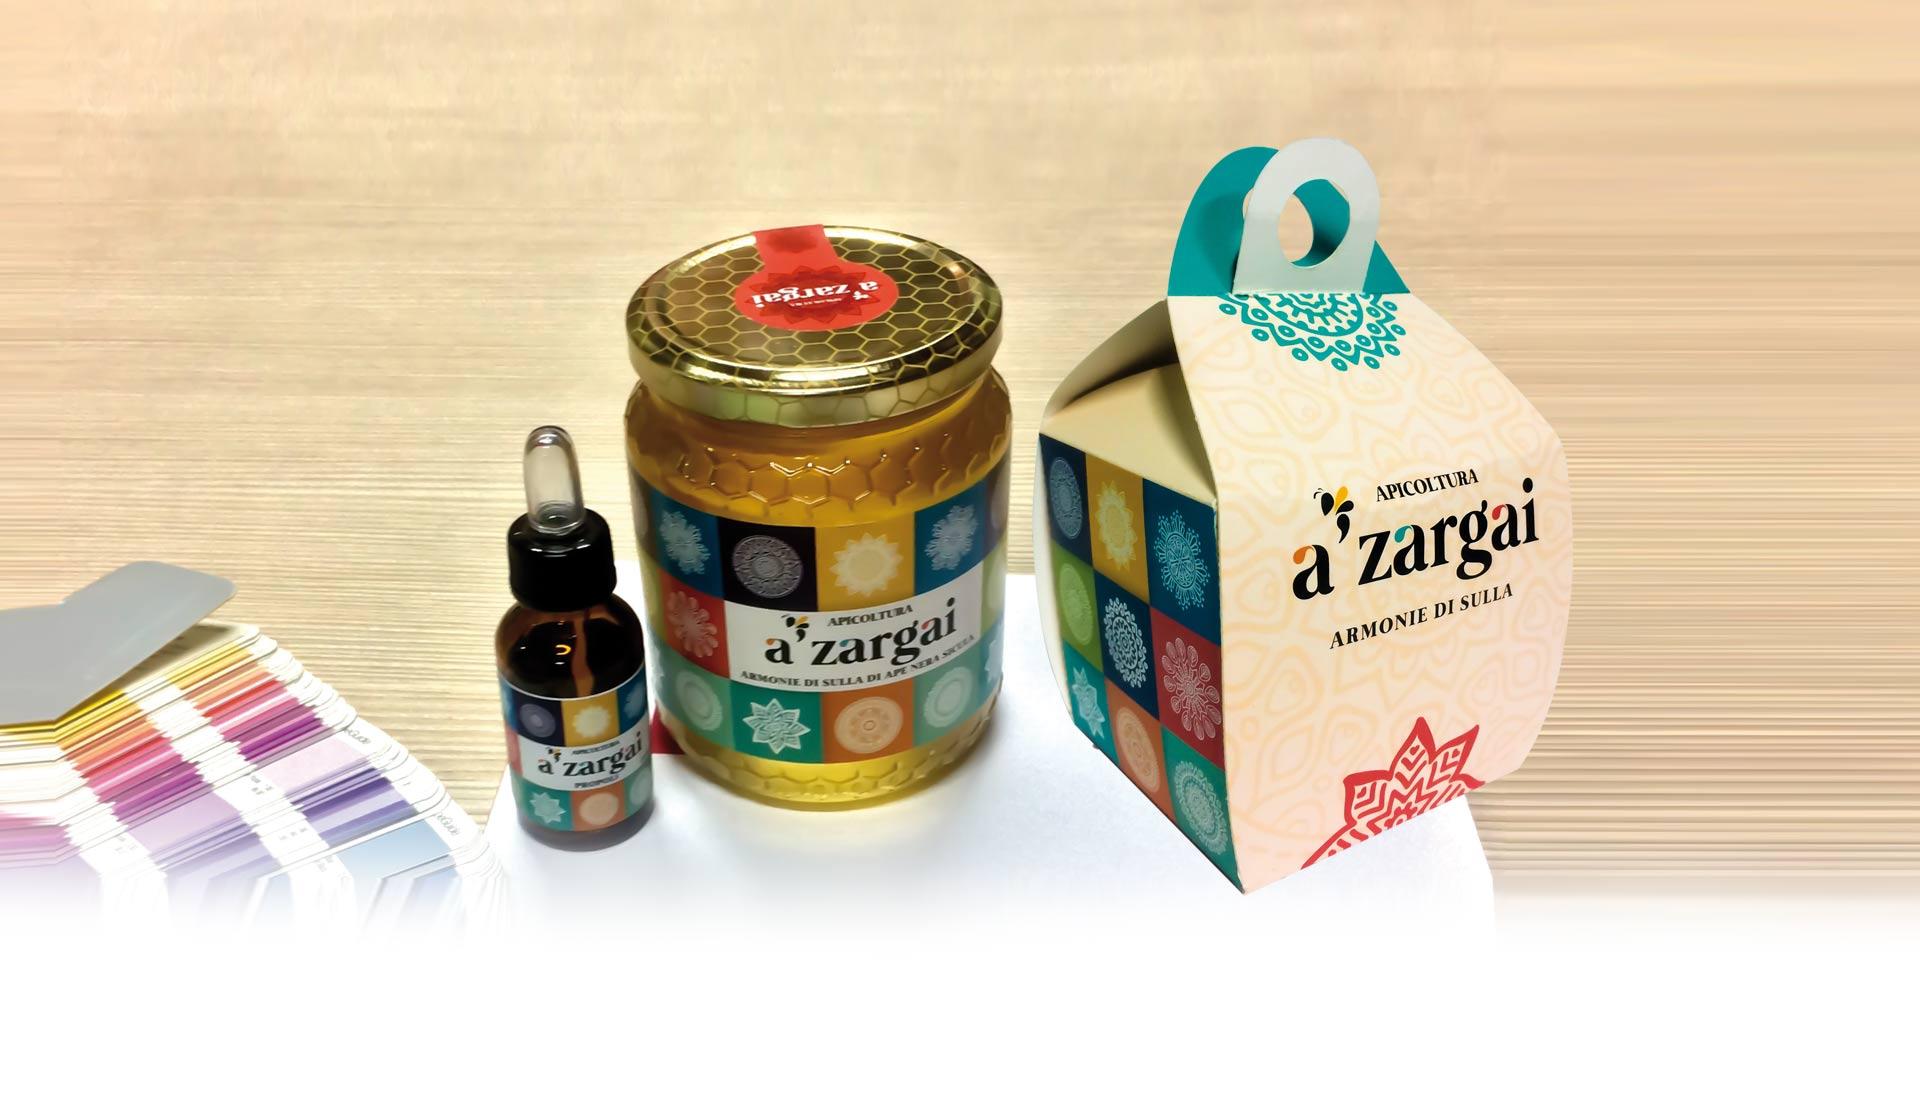 agarzai packaging